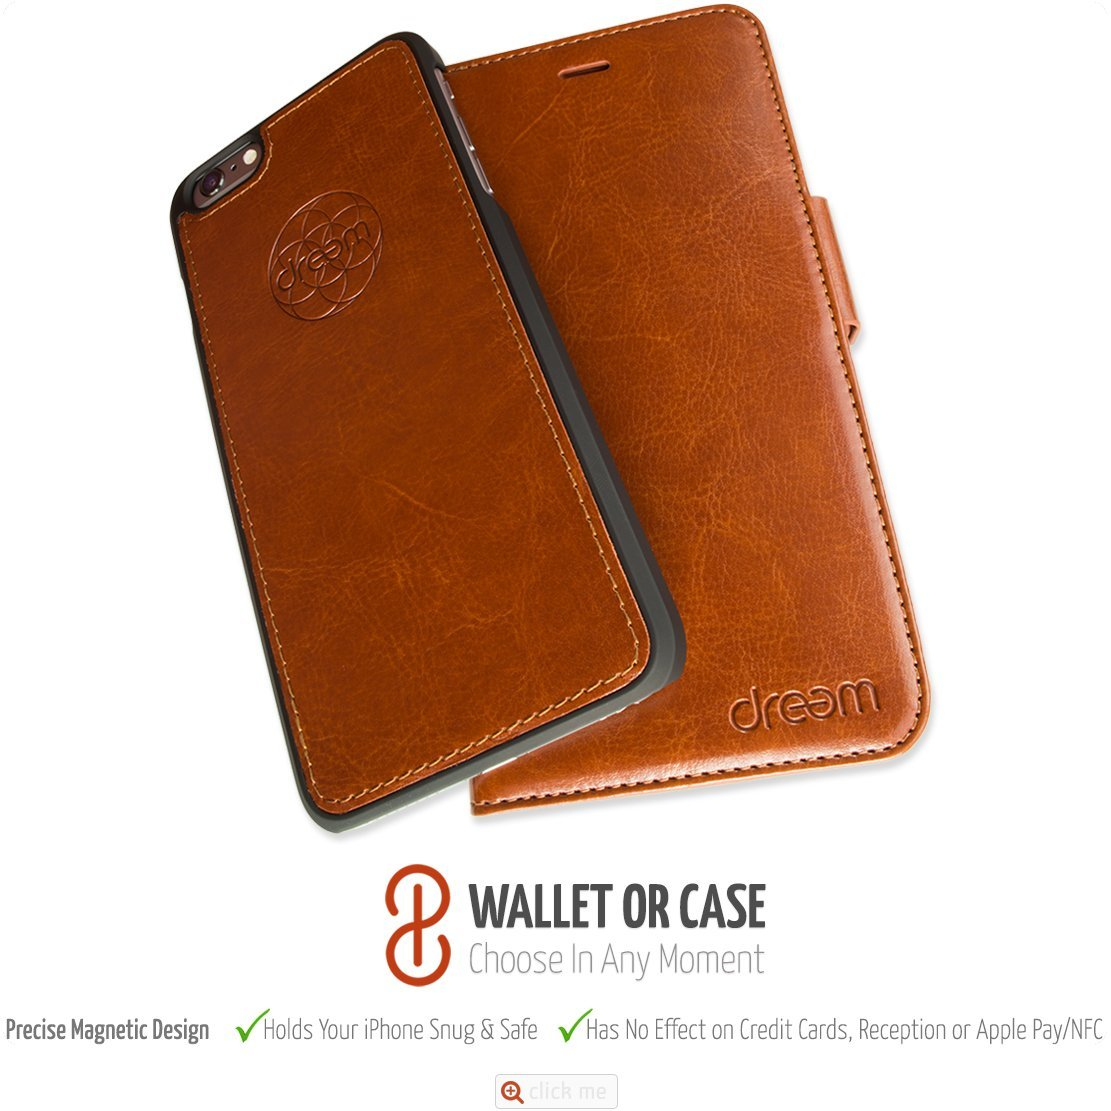 innovative design bad2c 36ba4 Dreem iPhone 7 PLUS Wallet Case with Detachable SlimCase, Fibonacci ...